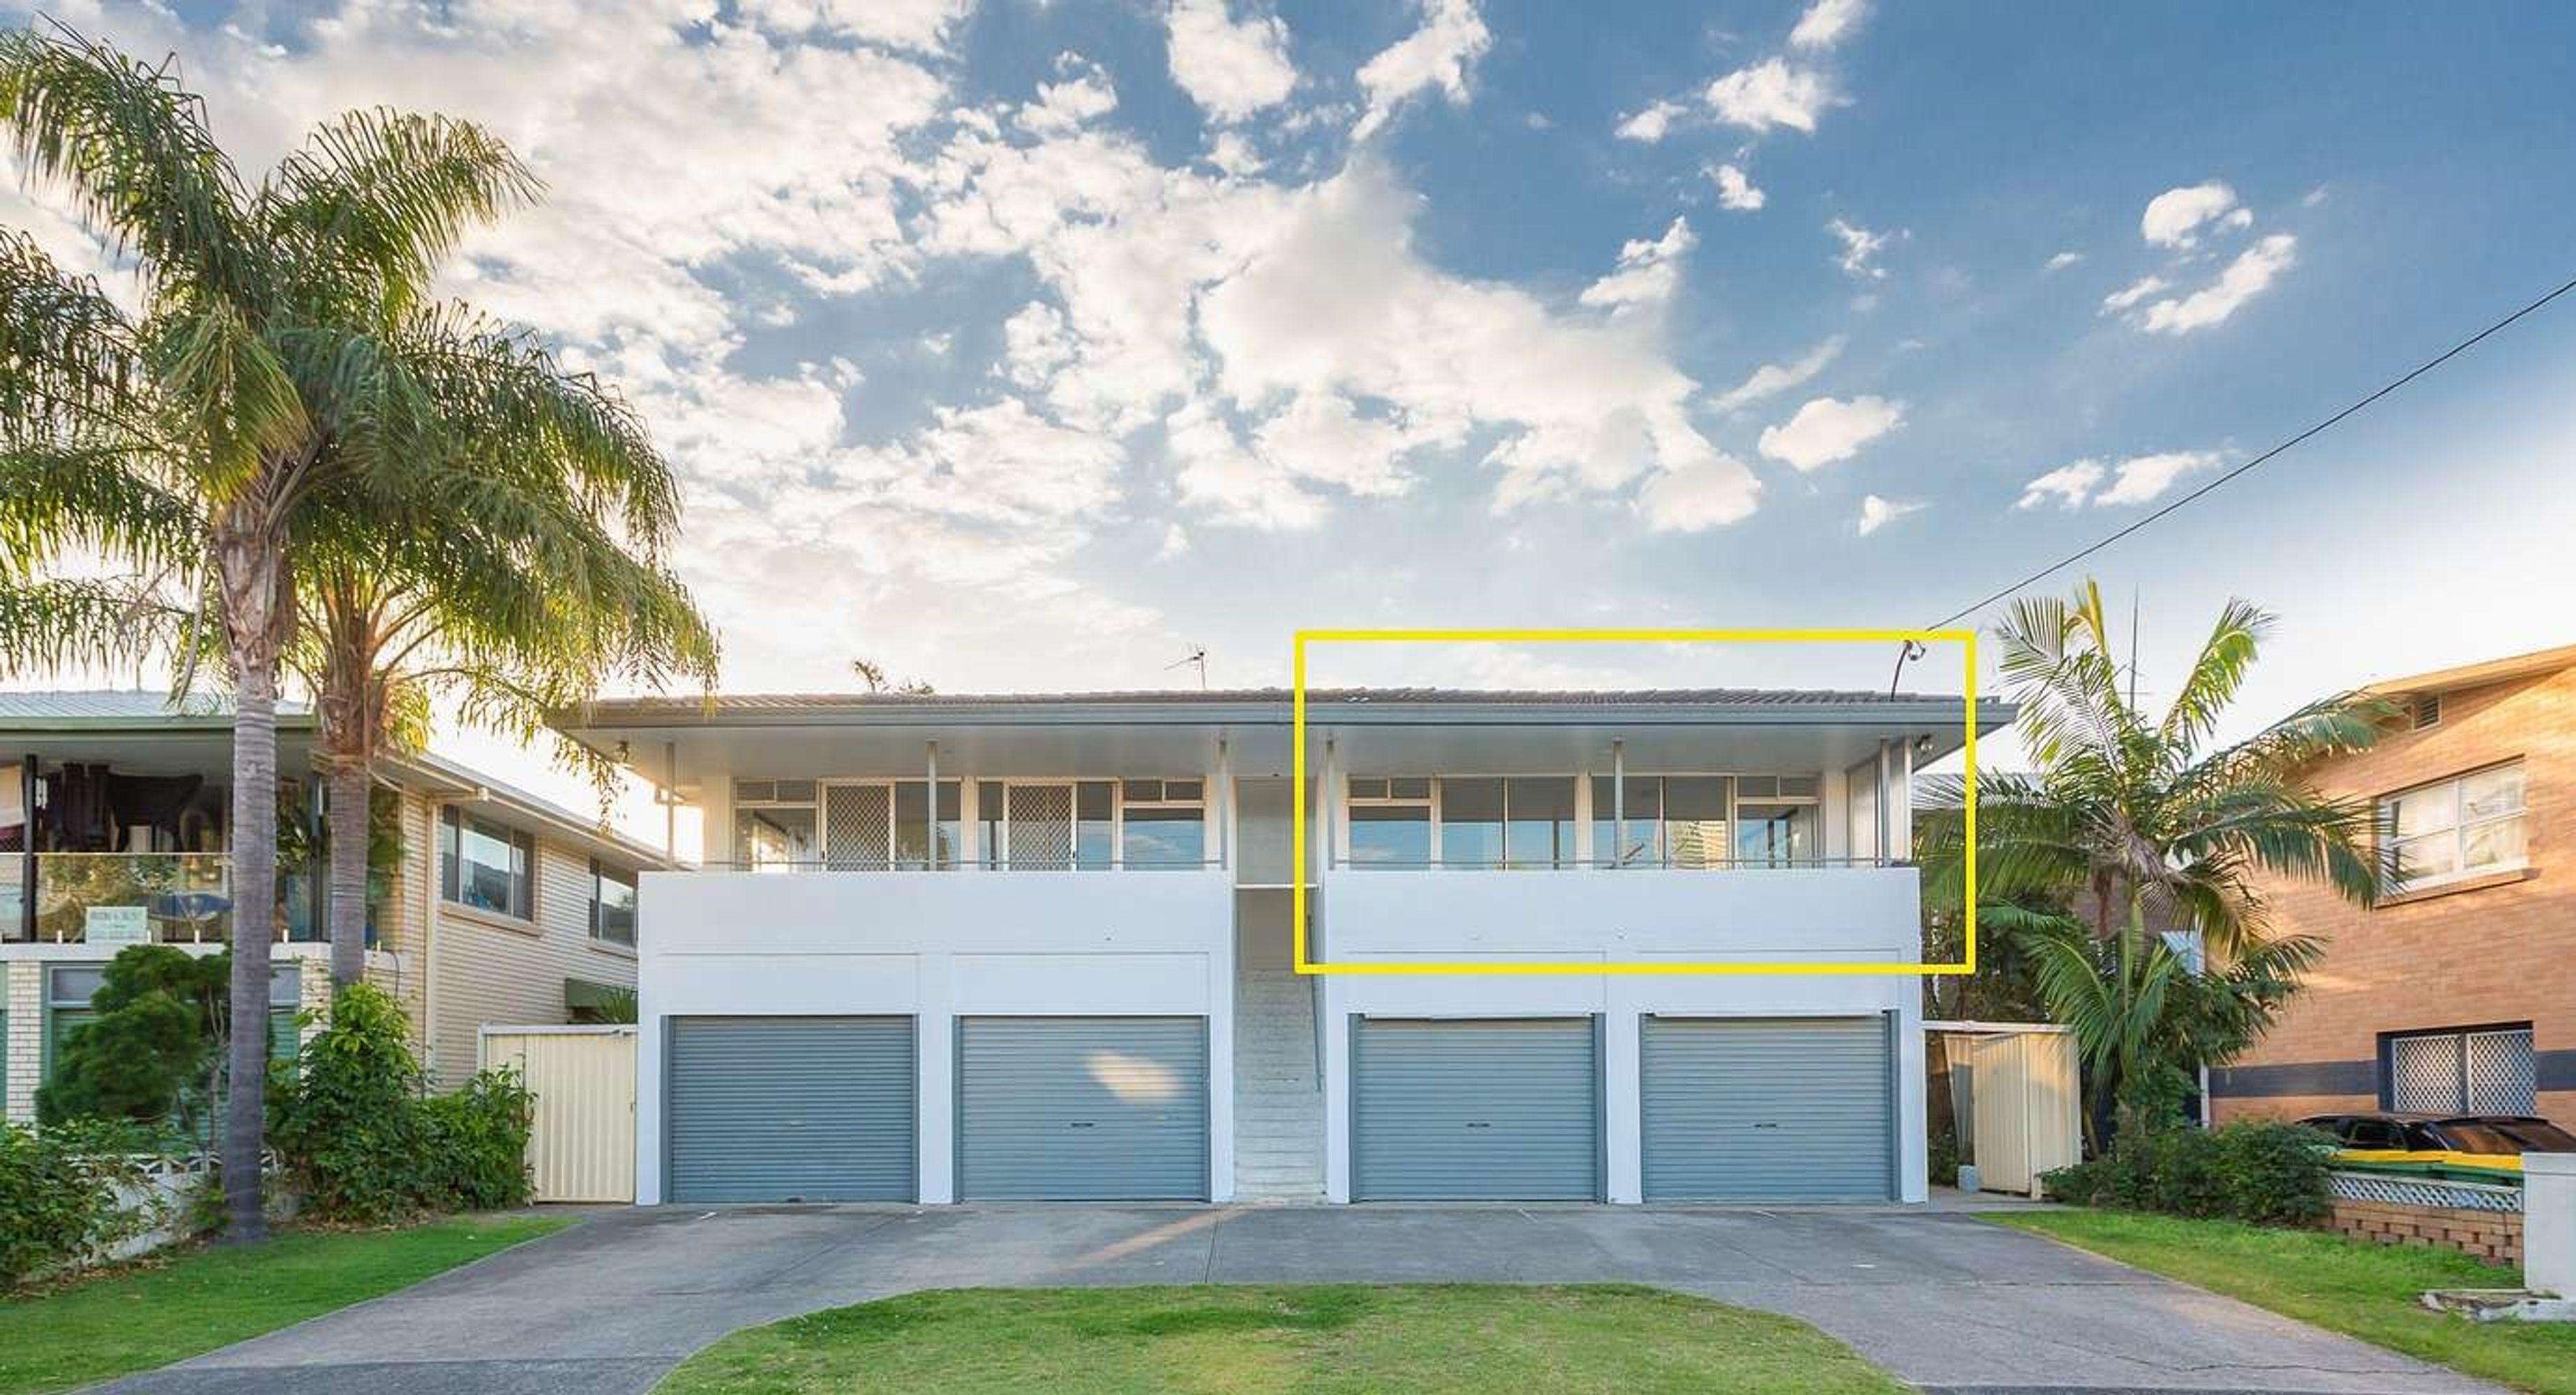 4/34 Leonard Avenue, Surfers Paradise, QLD 4217